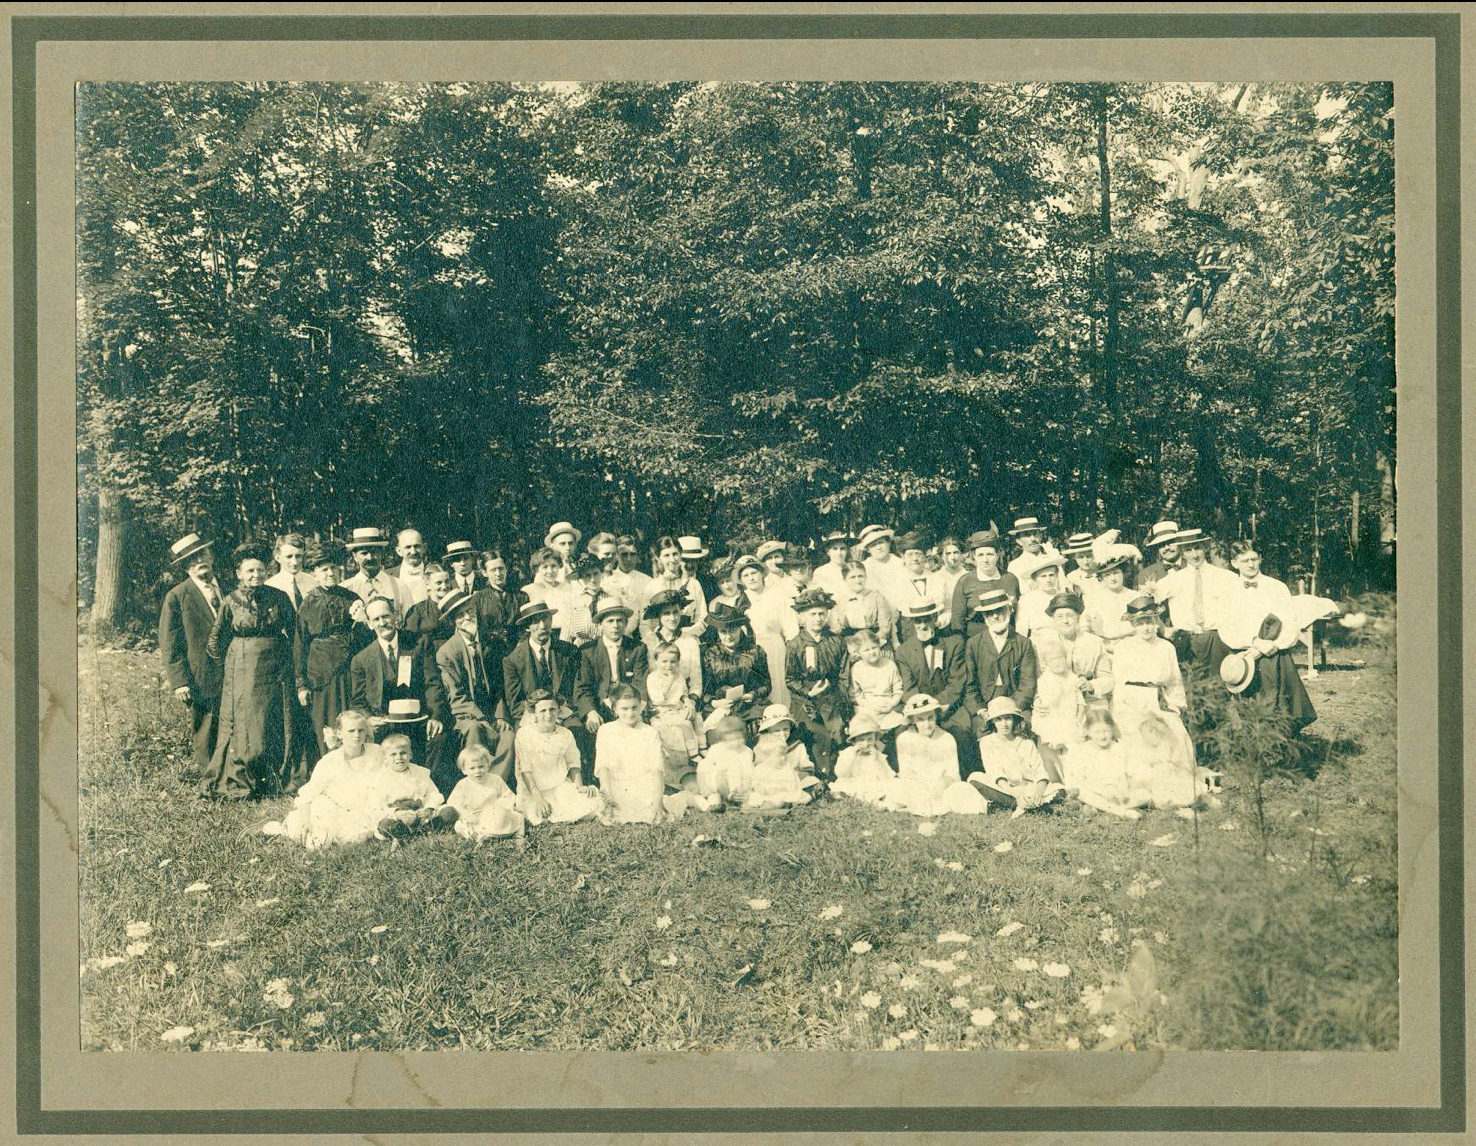 1915 Reunion